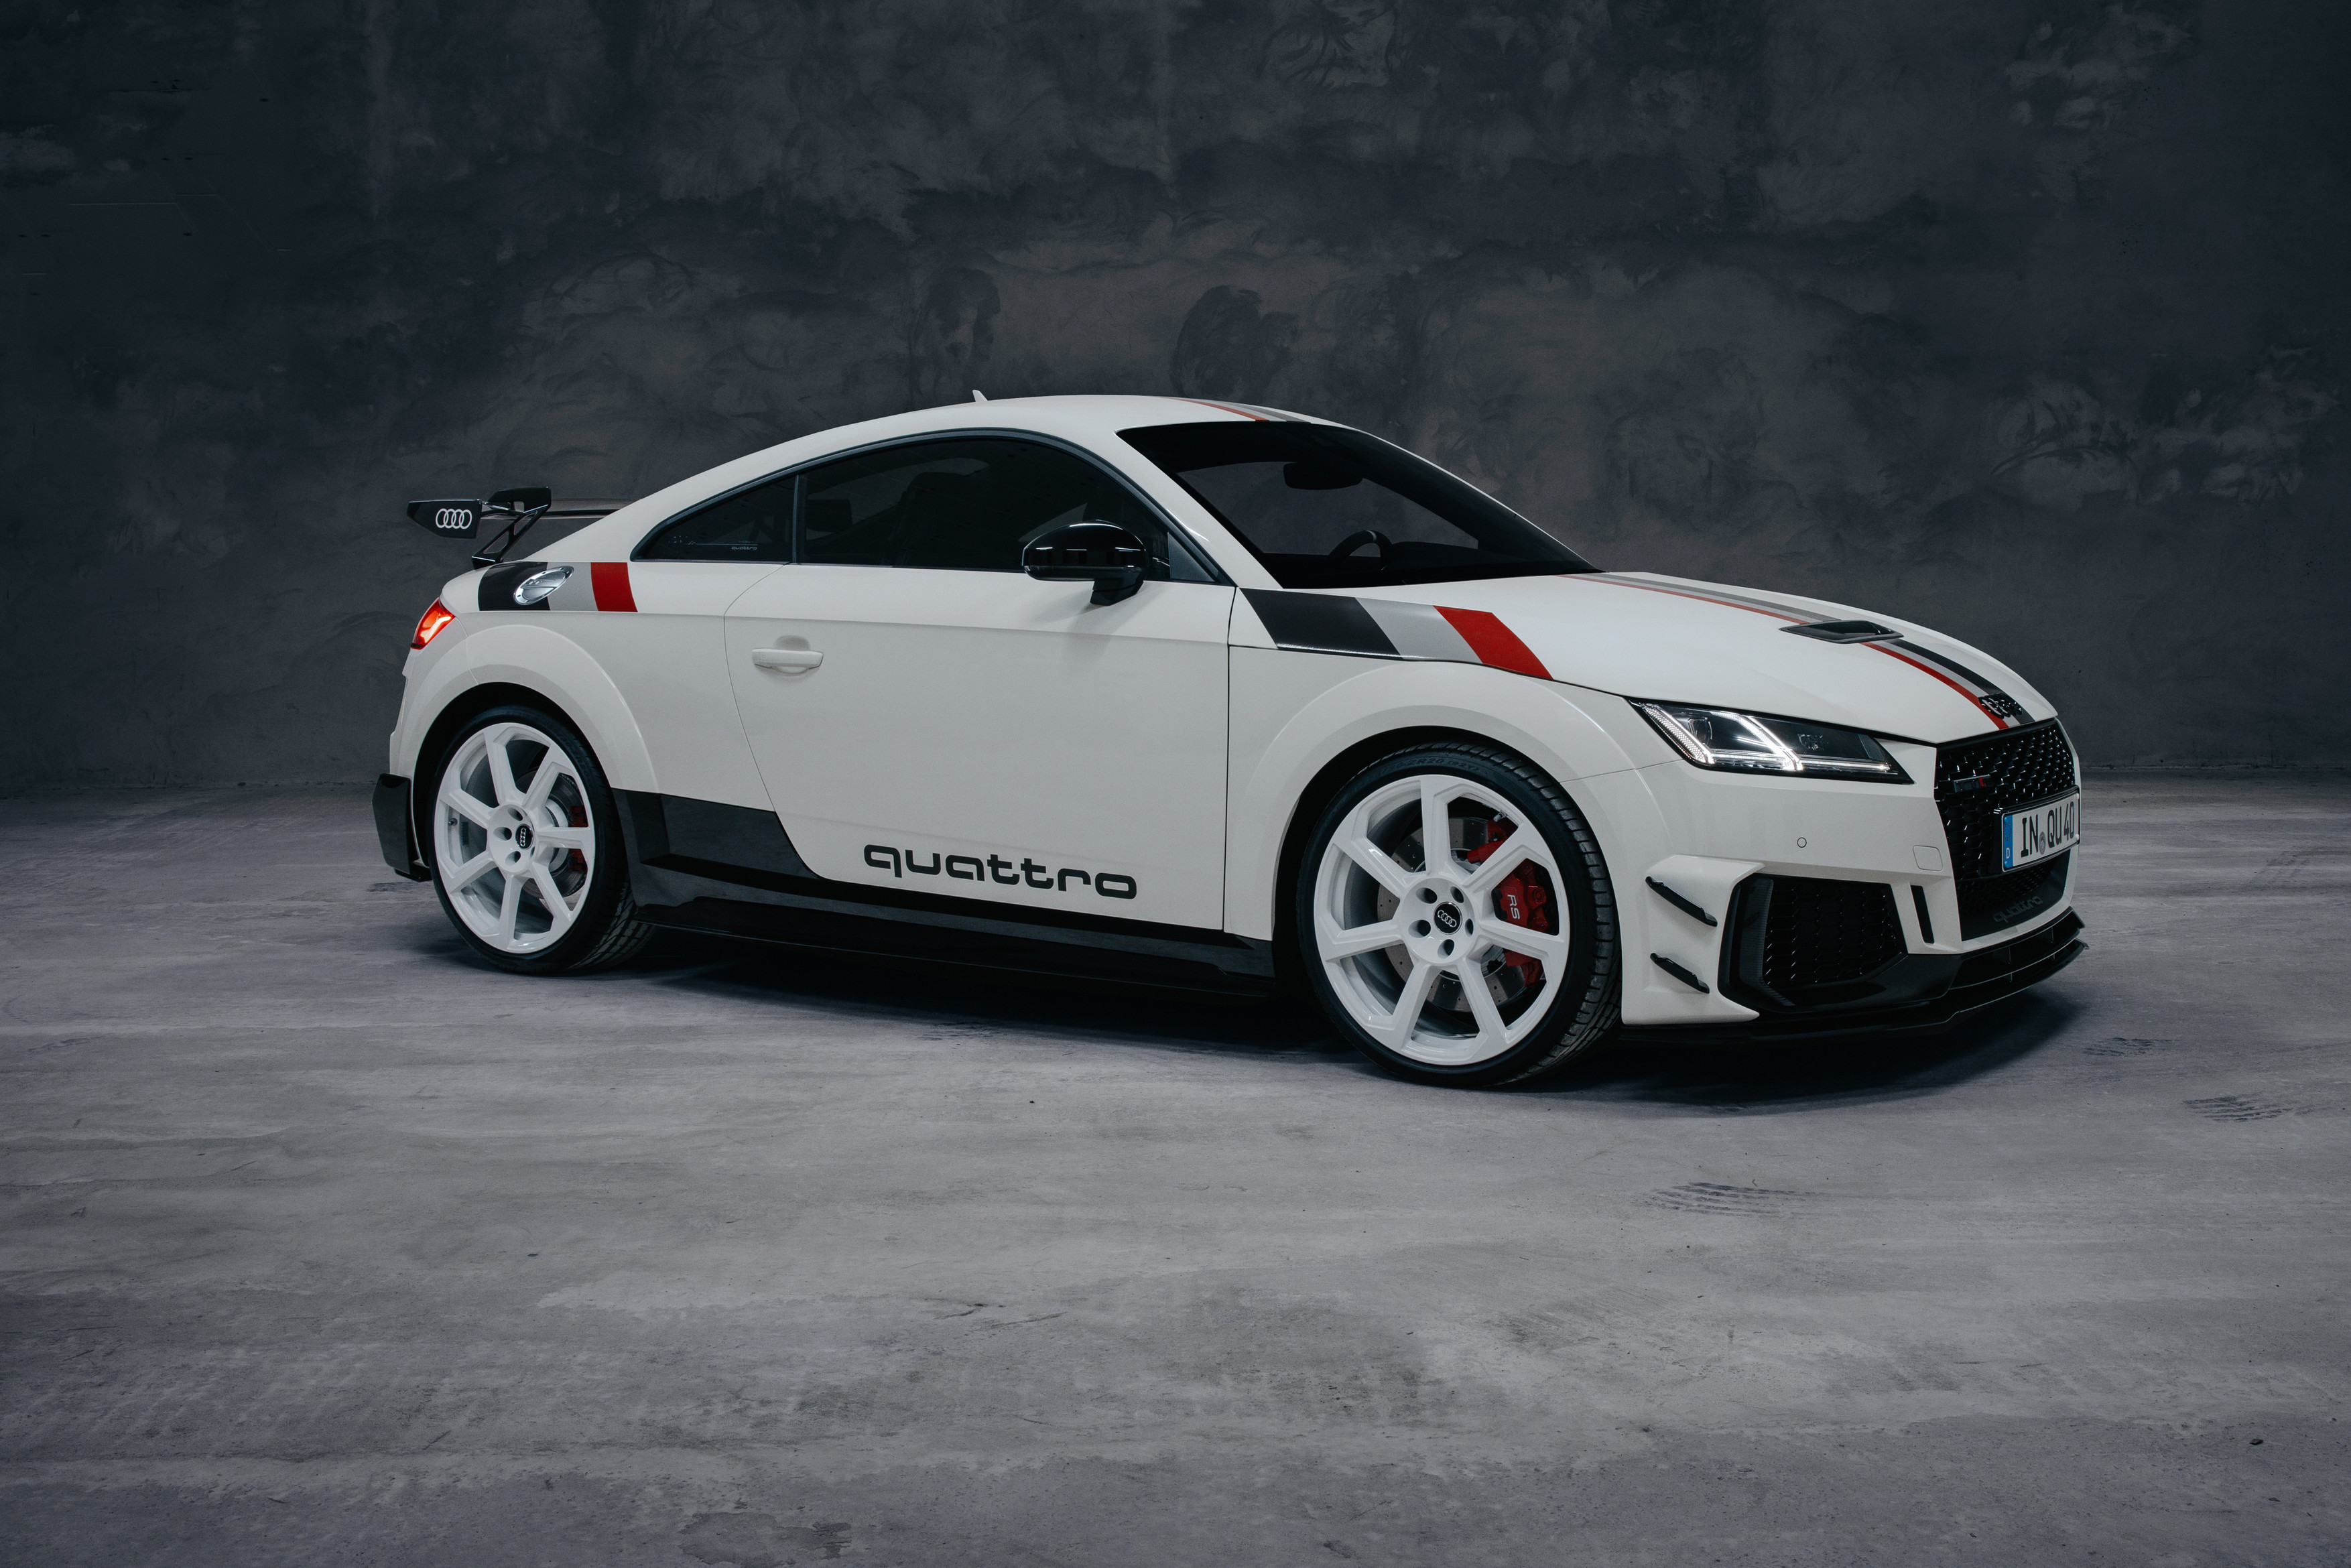 In Detail Audi RS Cabriolet Fourtitudecom - Audi 5 car